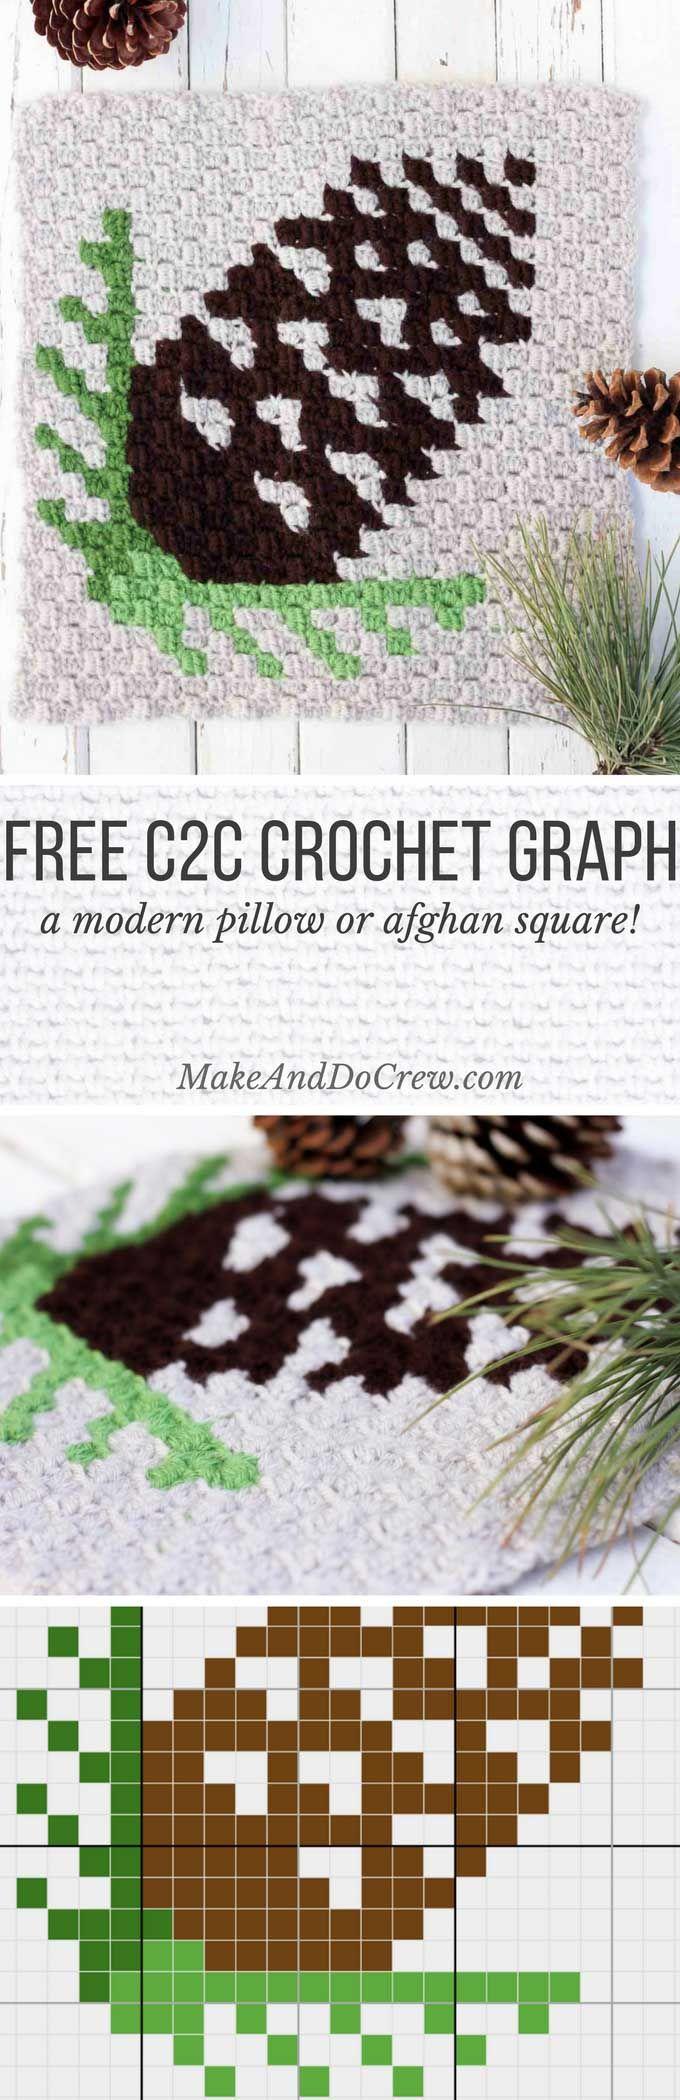 C2C Crochet Pinecone Pattern - Free Graph! | Tejido, Bordado y ...